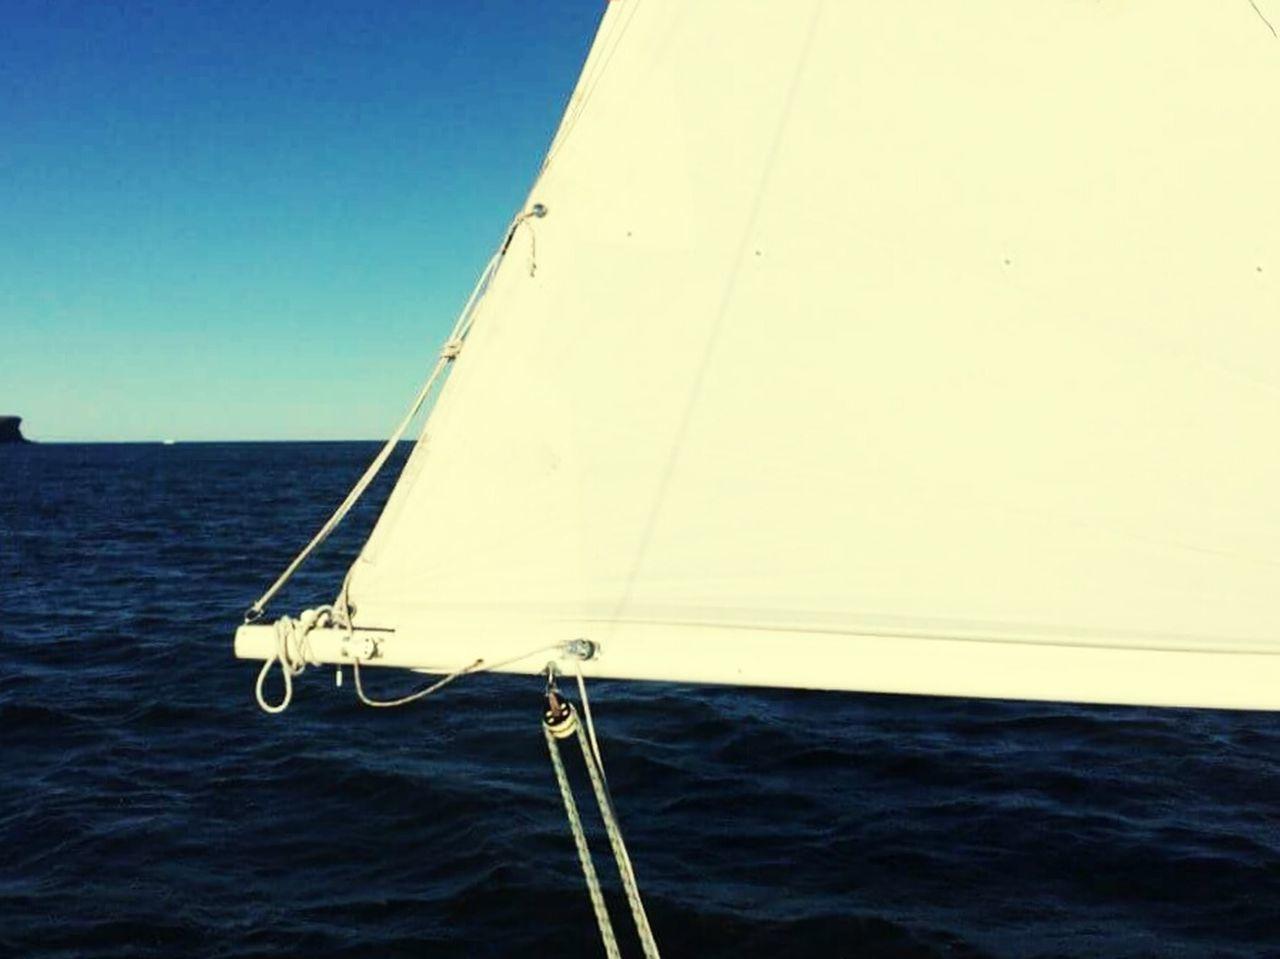 Sea Sailing Nautical Vessel Water Sailing Ship Sport Outdoors Sailboat Horizon Over Water No People Nature Sky Day Yachting